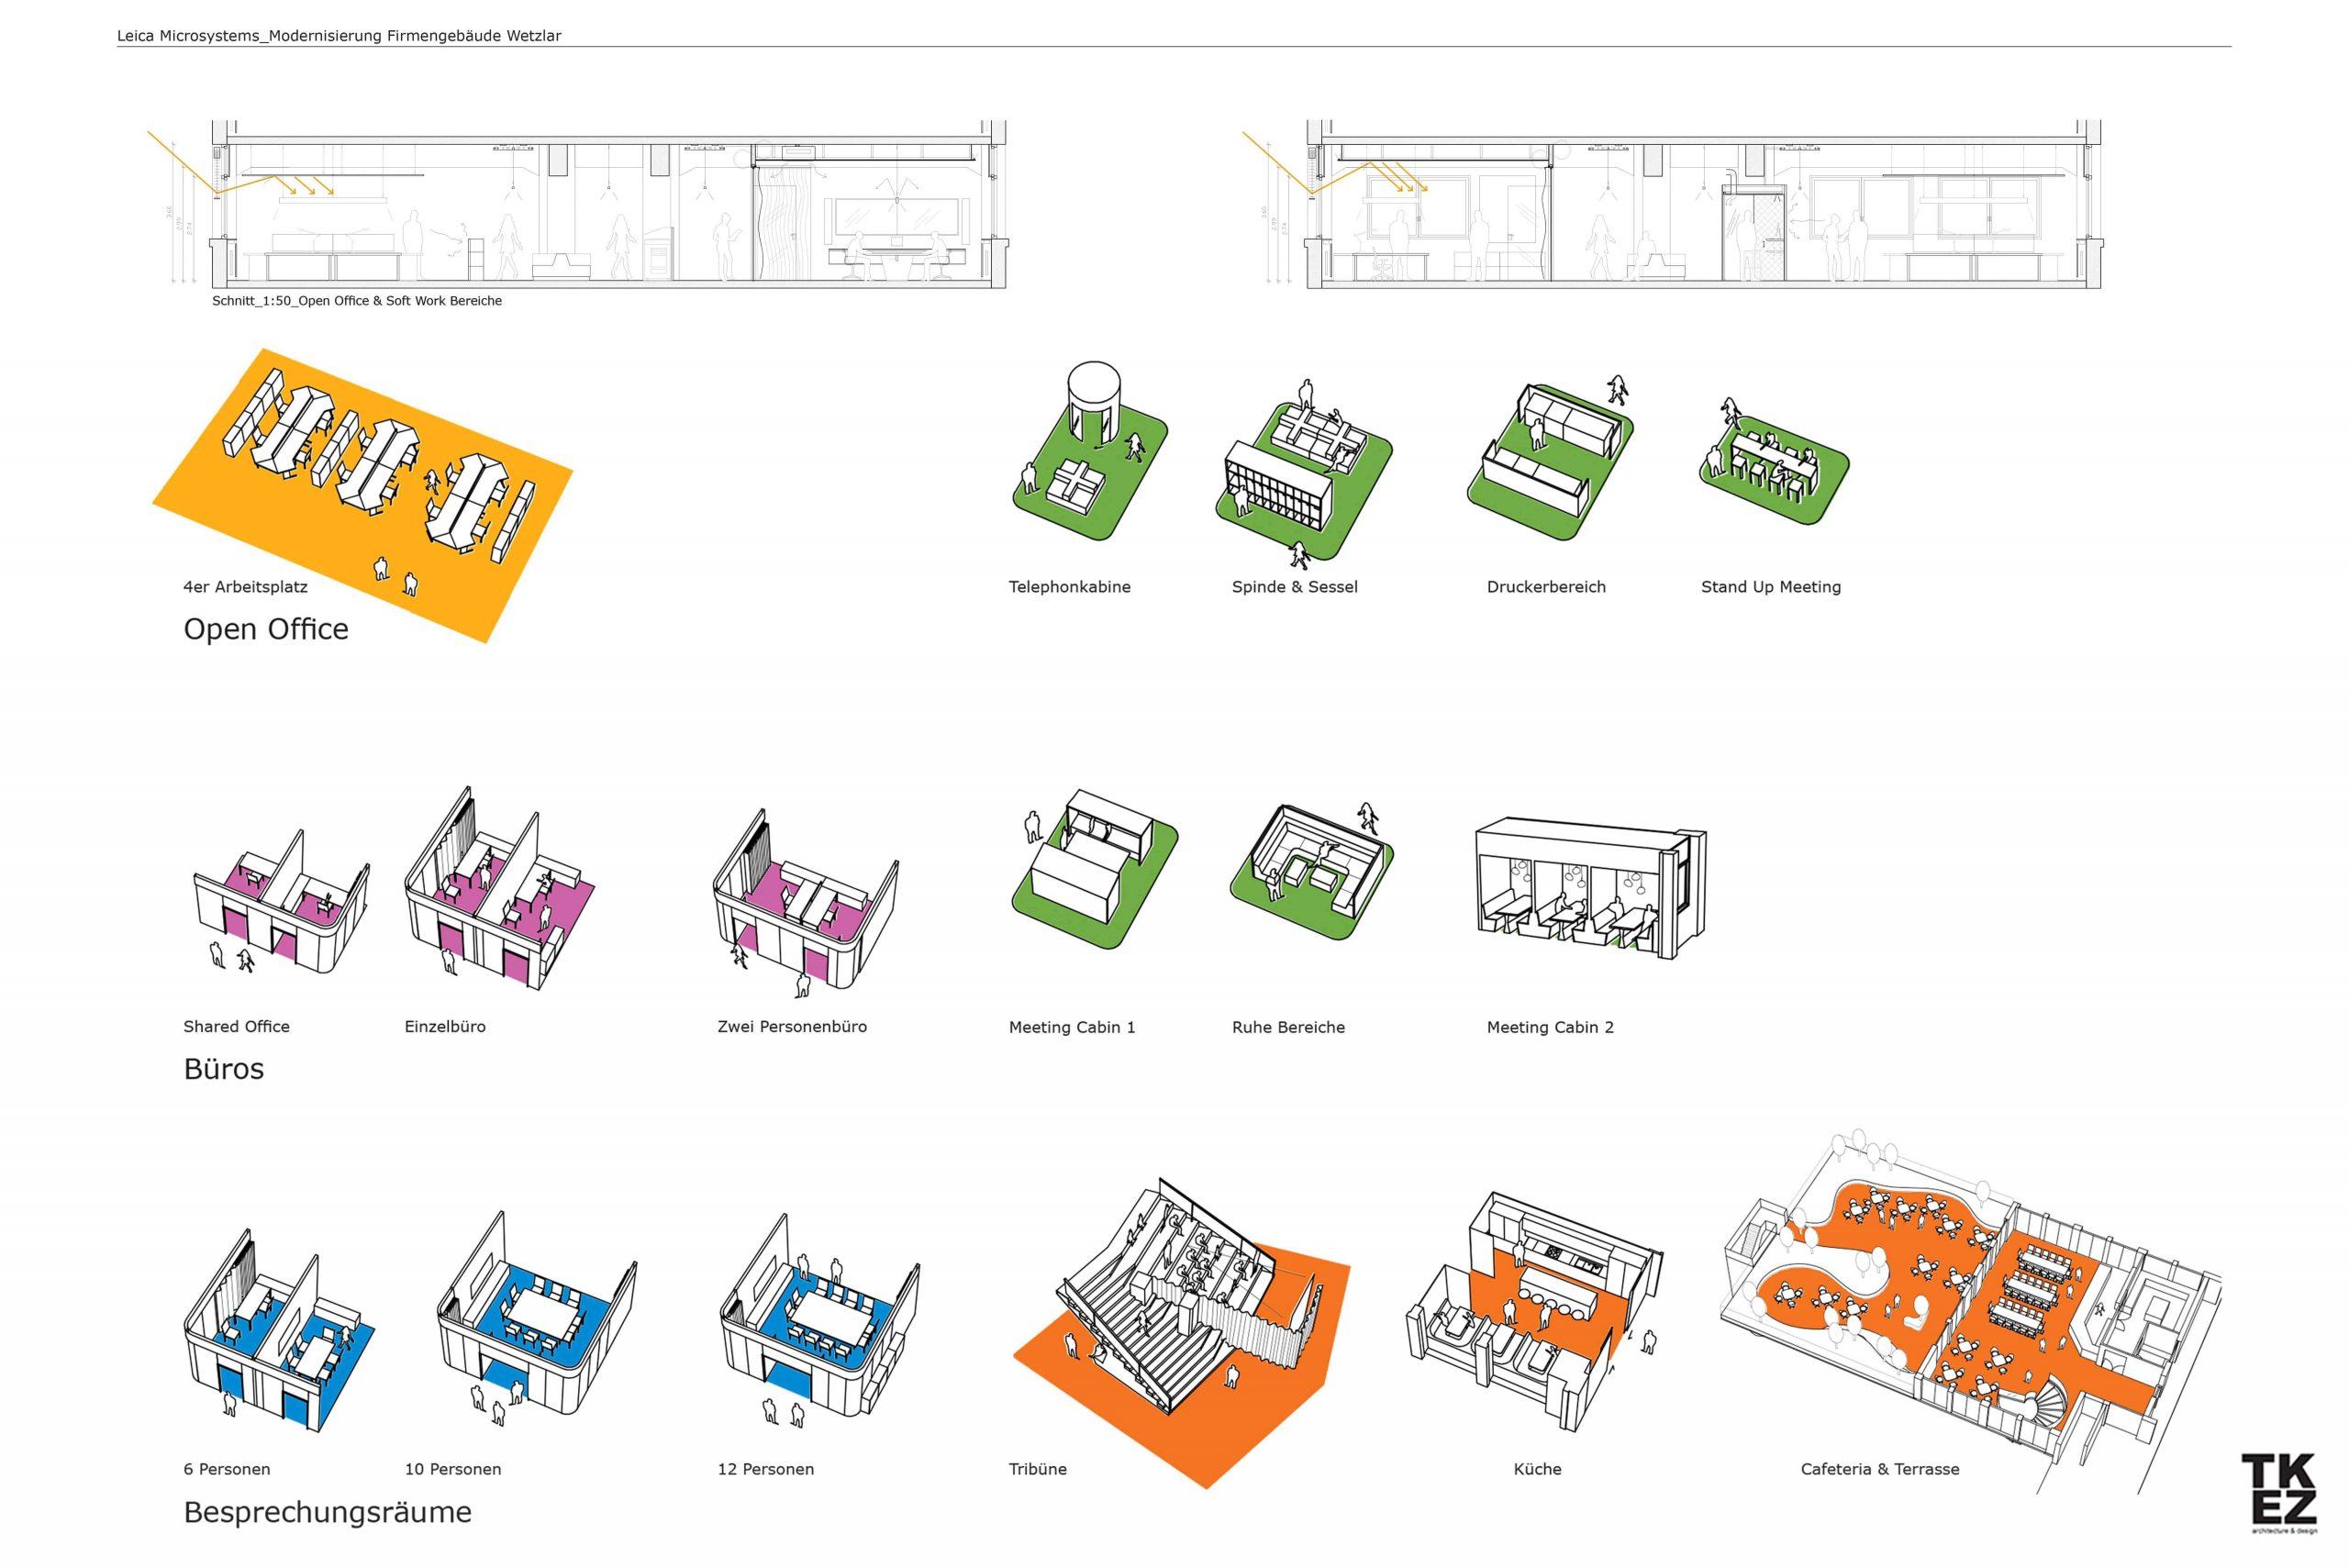 Office Design Leica Mircosystems Architekturbüro TKEZ Piktogramme